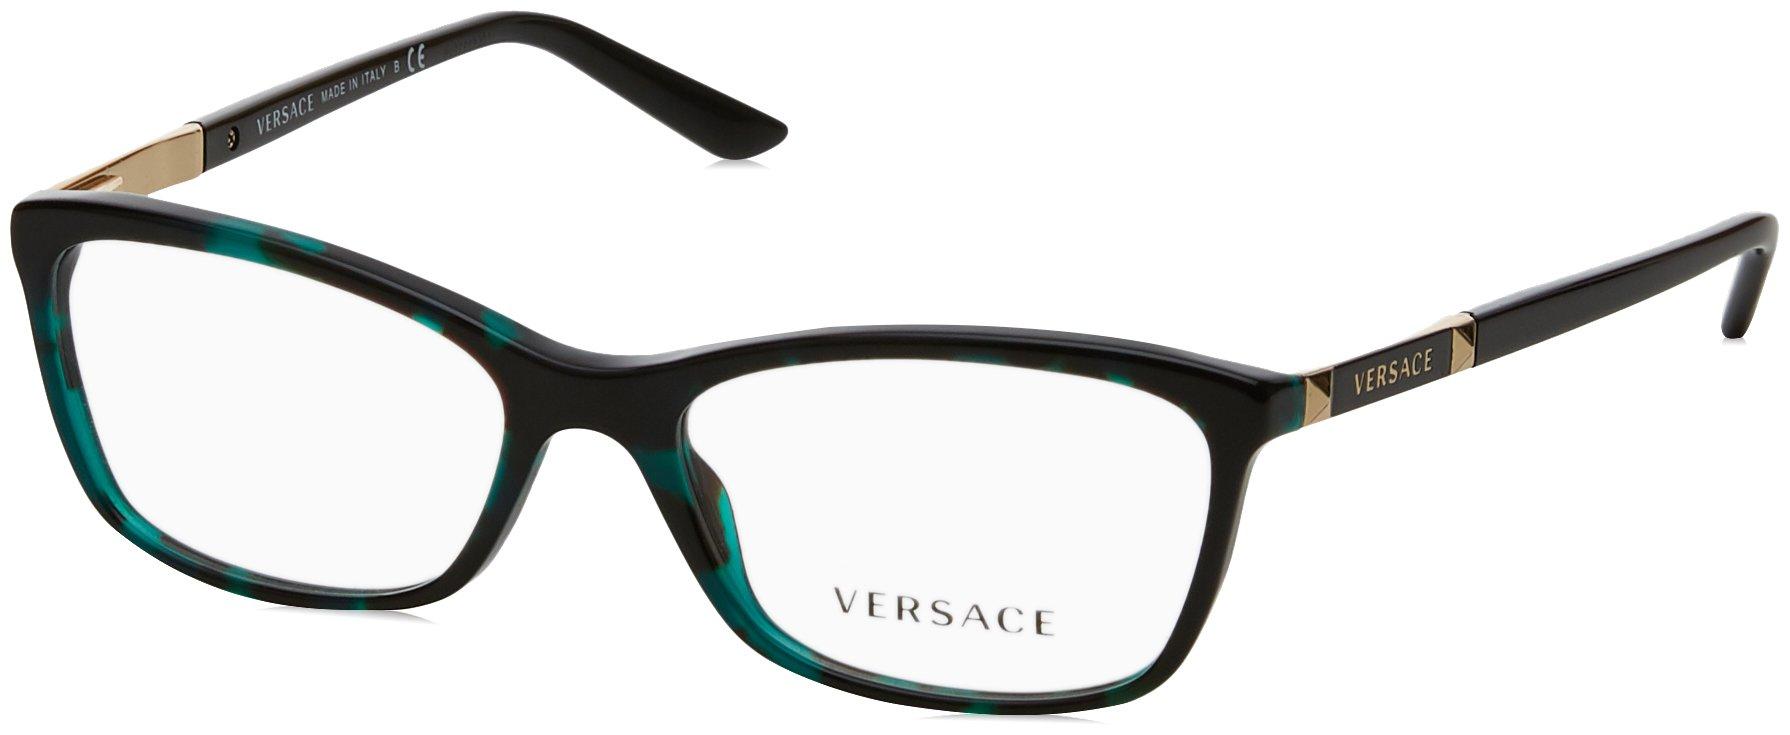 Versace VE3186 Eyeglass Frames 5076-52 - Green Havana Transp VE3186-5076-52